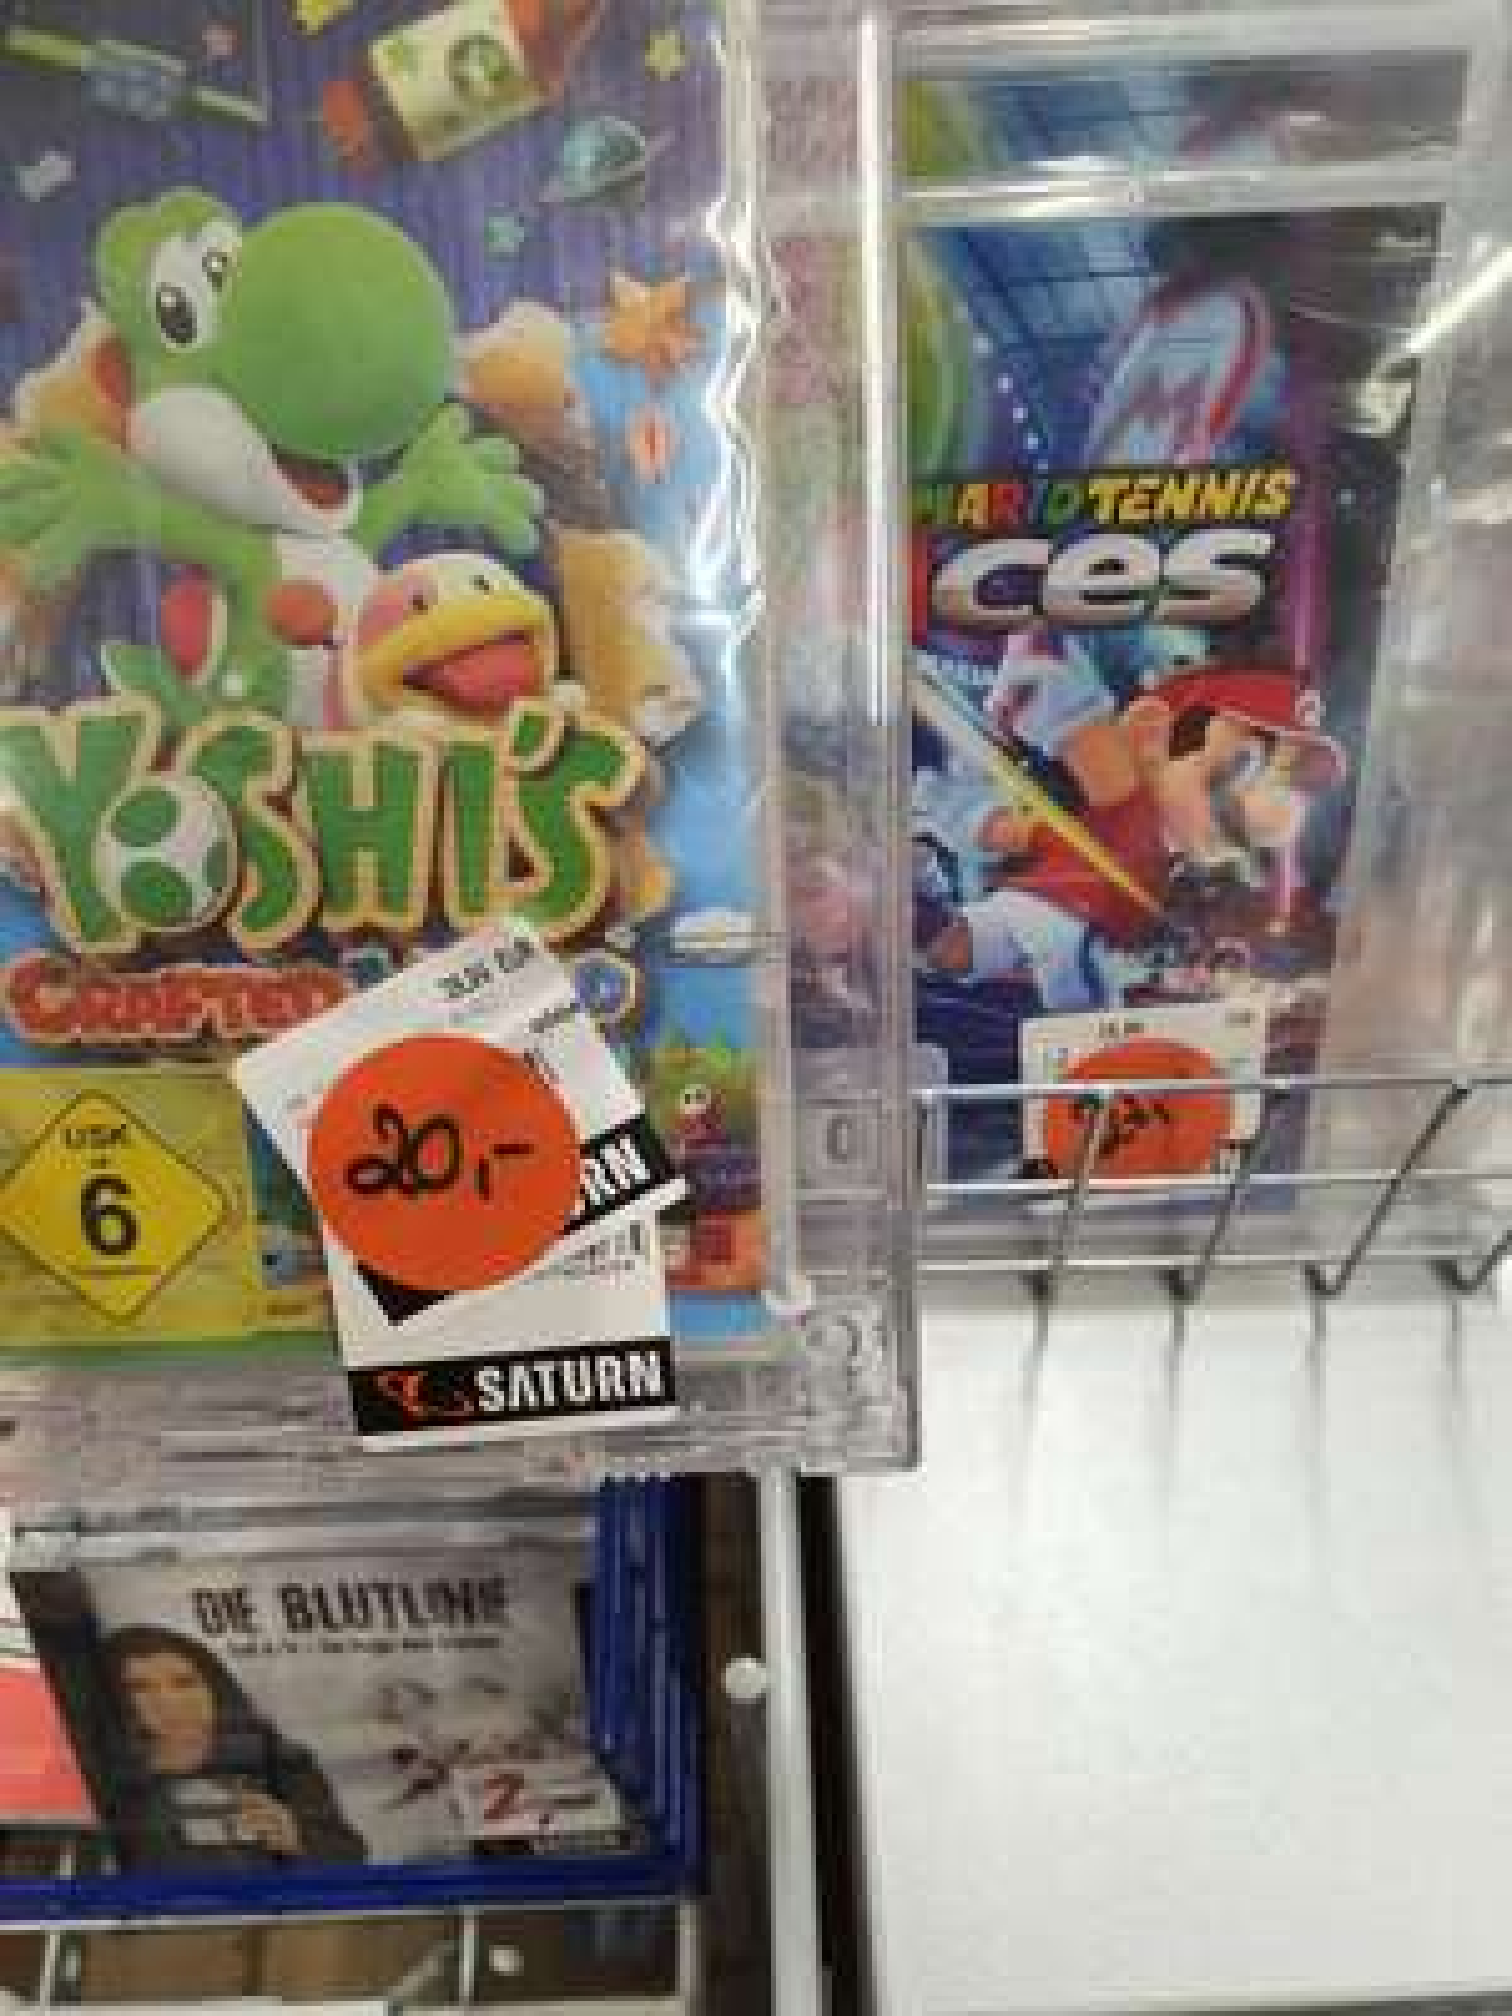 [Lokal] Yoshi crafted world 20€, Mario Tennis aces 27€ Nintendo Switch - Saturn Reutlingen